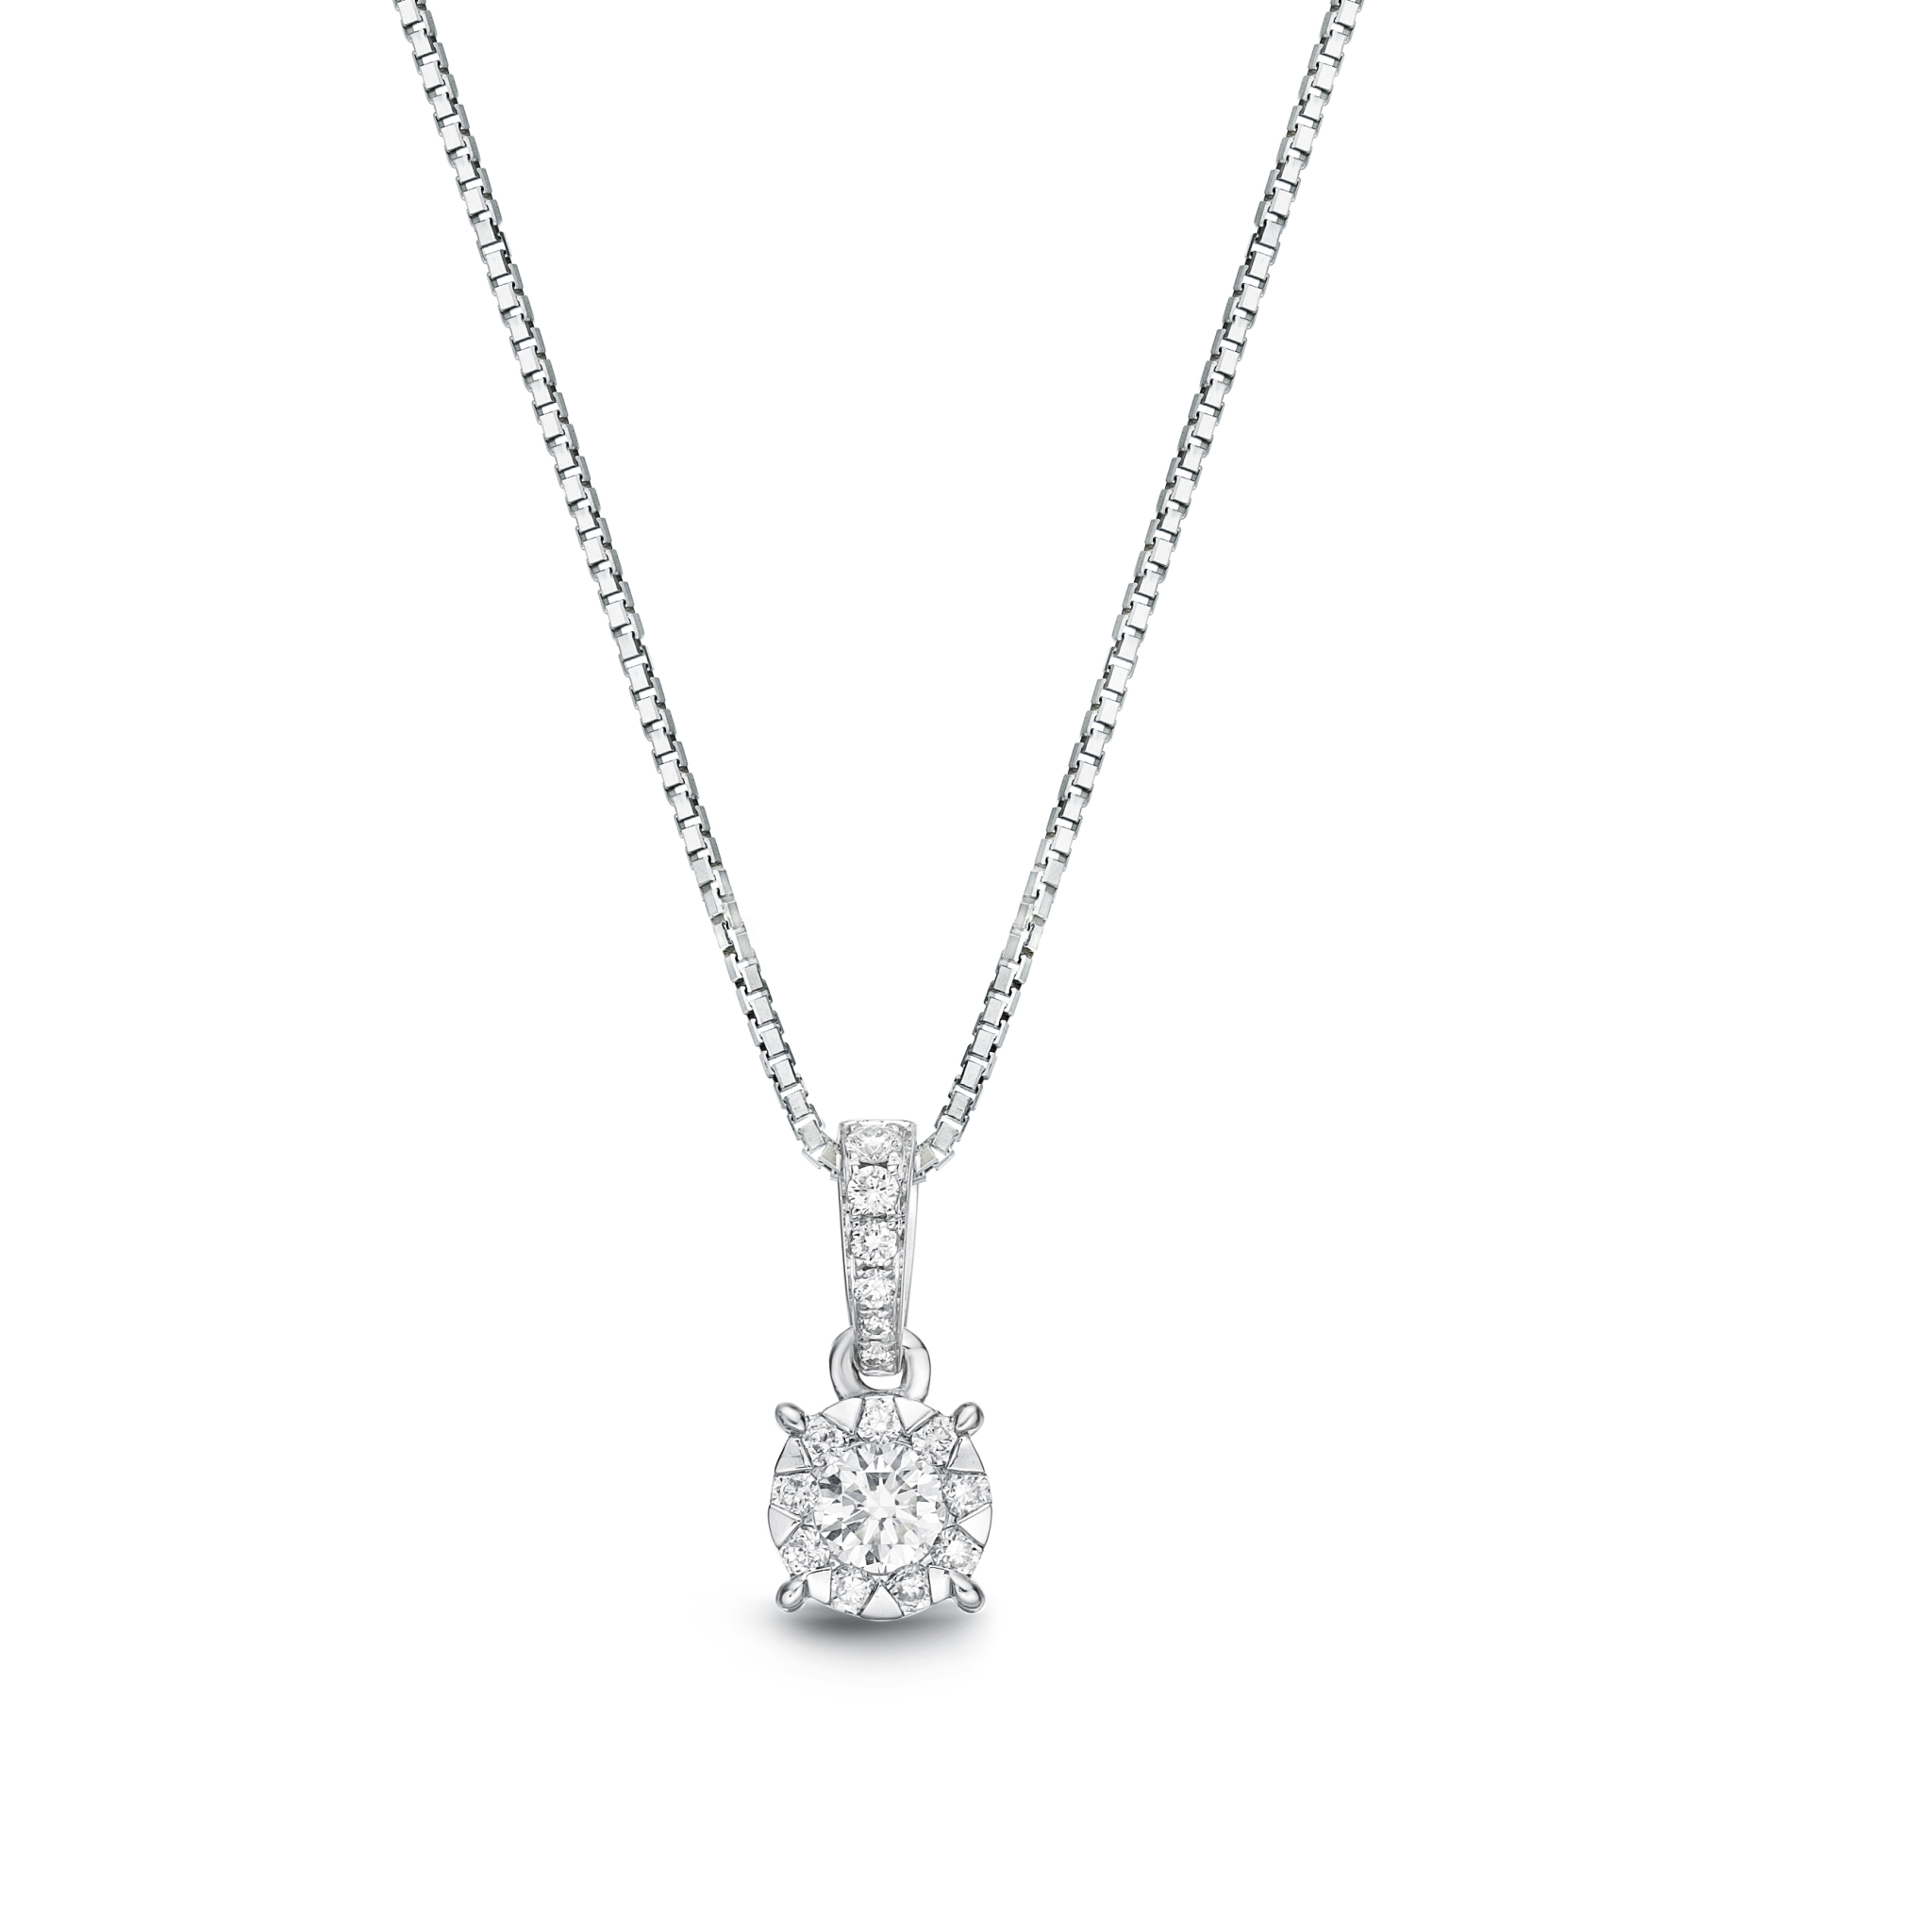 Memoire 18ct White Gold 0.30 Carat Diamond Bale 4 Prong Pendant with Chain